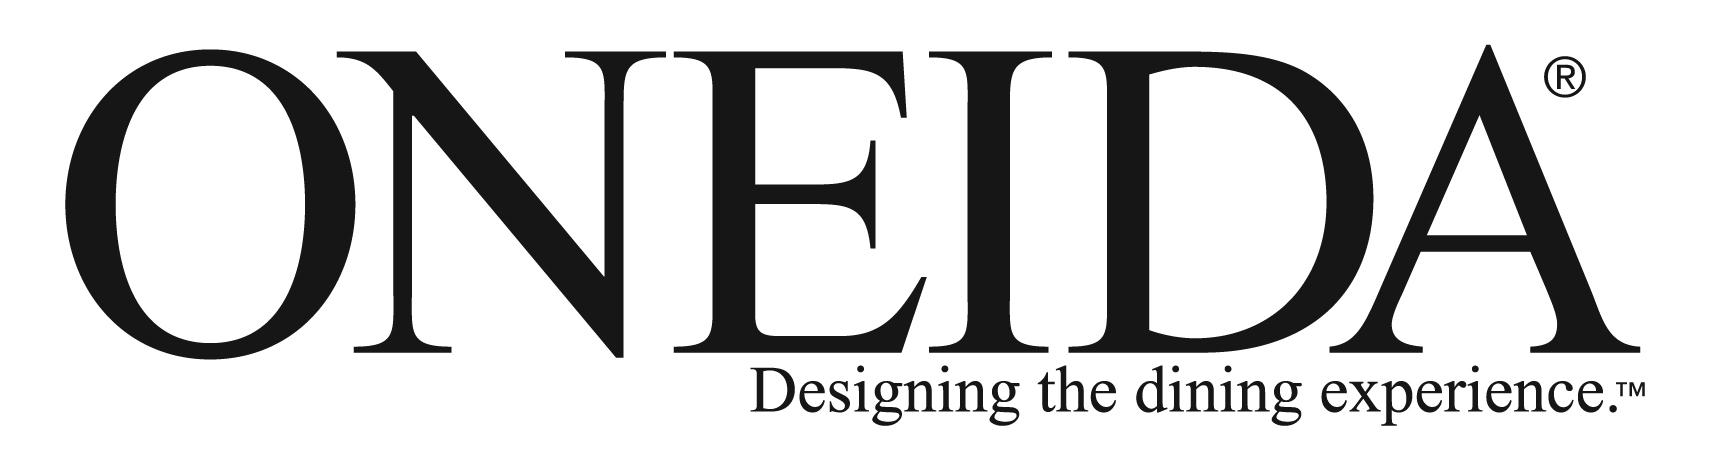 EveryWare Global Inc. Announces Merger of Housewares ...